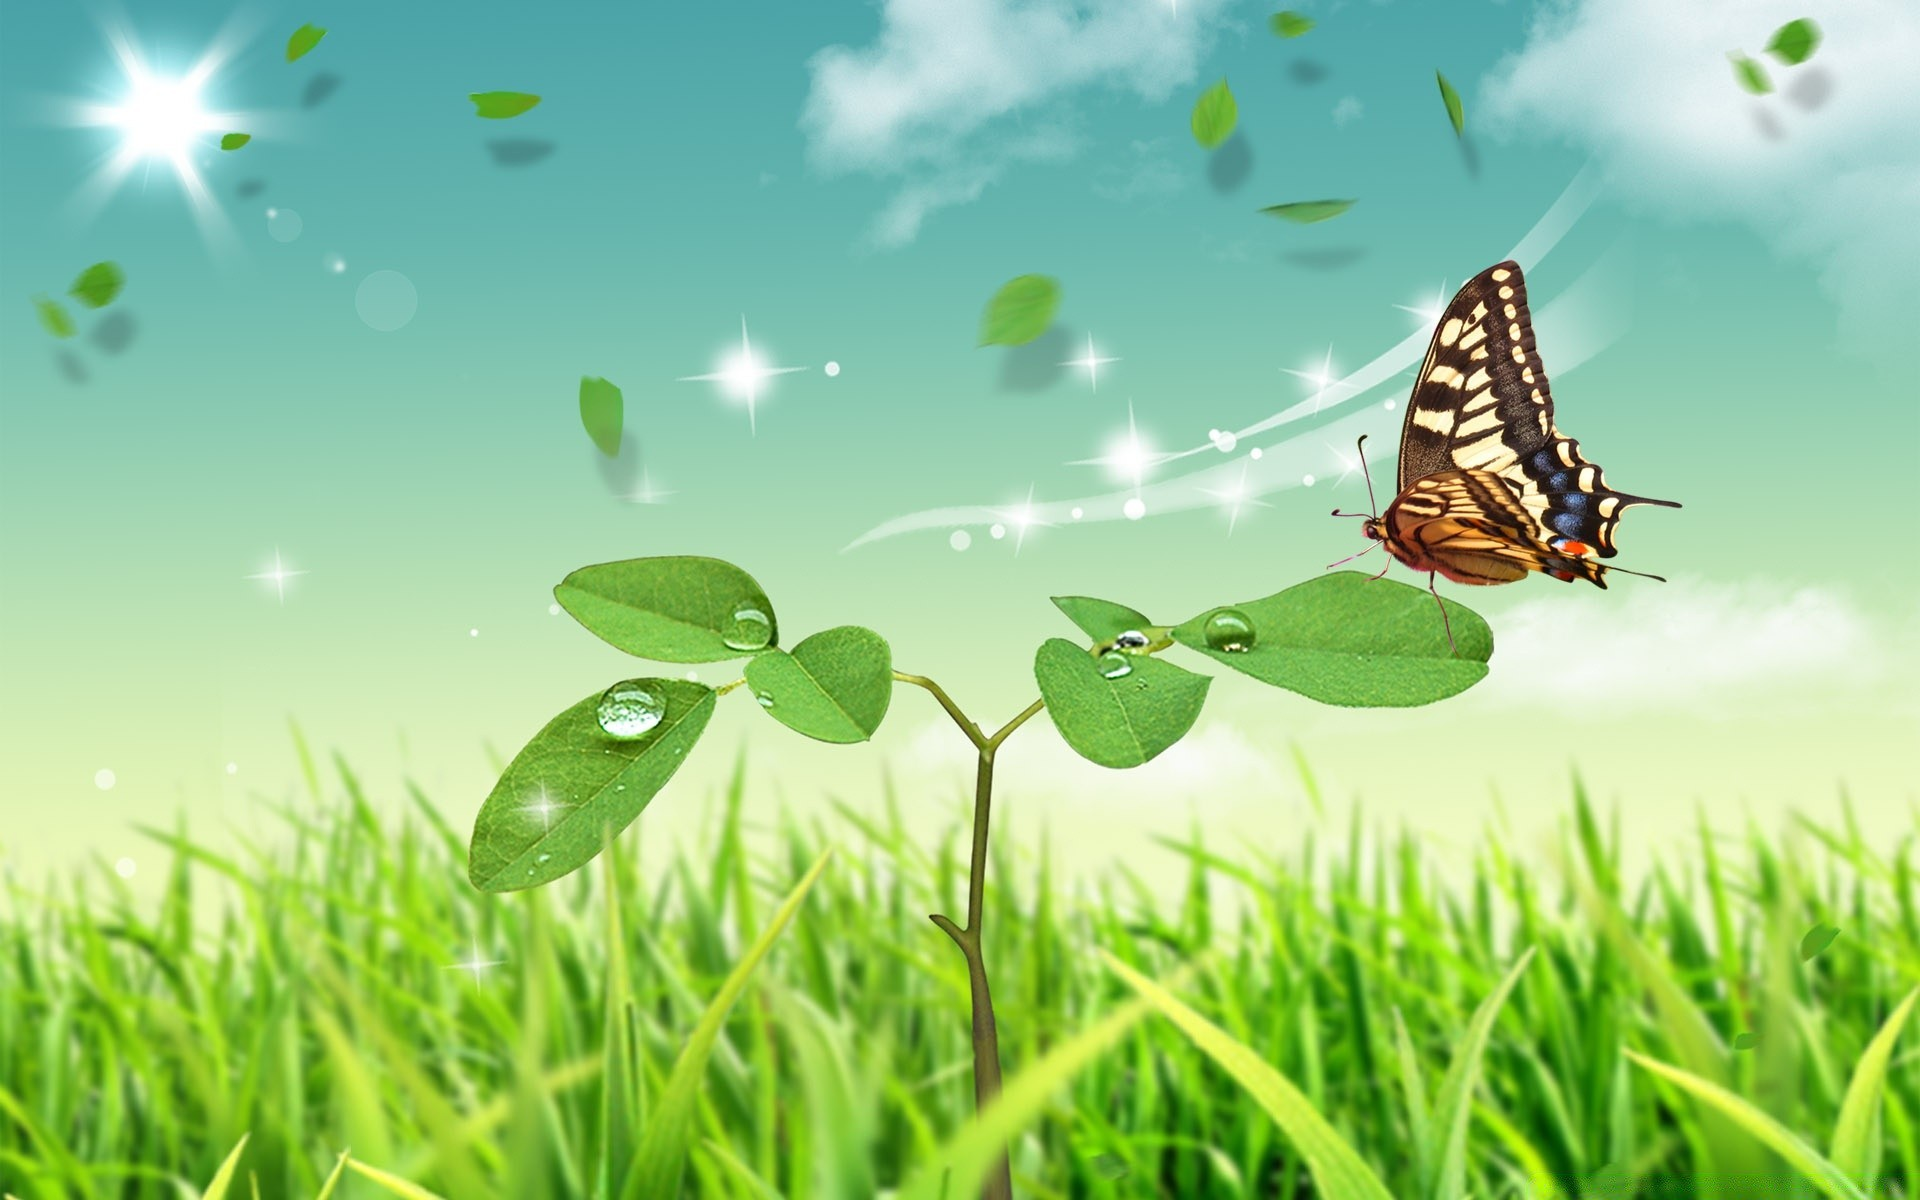 бабочка на зеленой траве  № 1396140 бесплатно